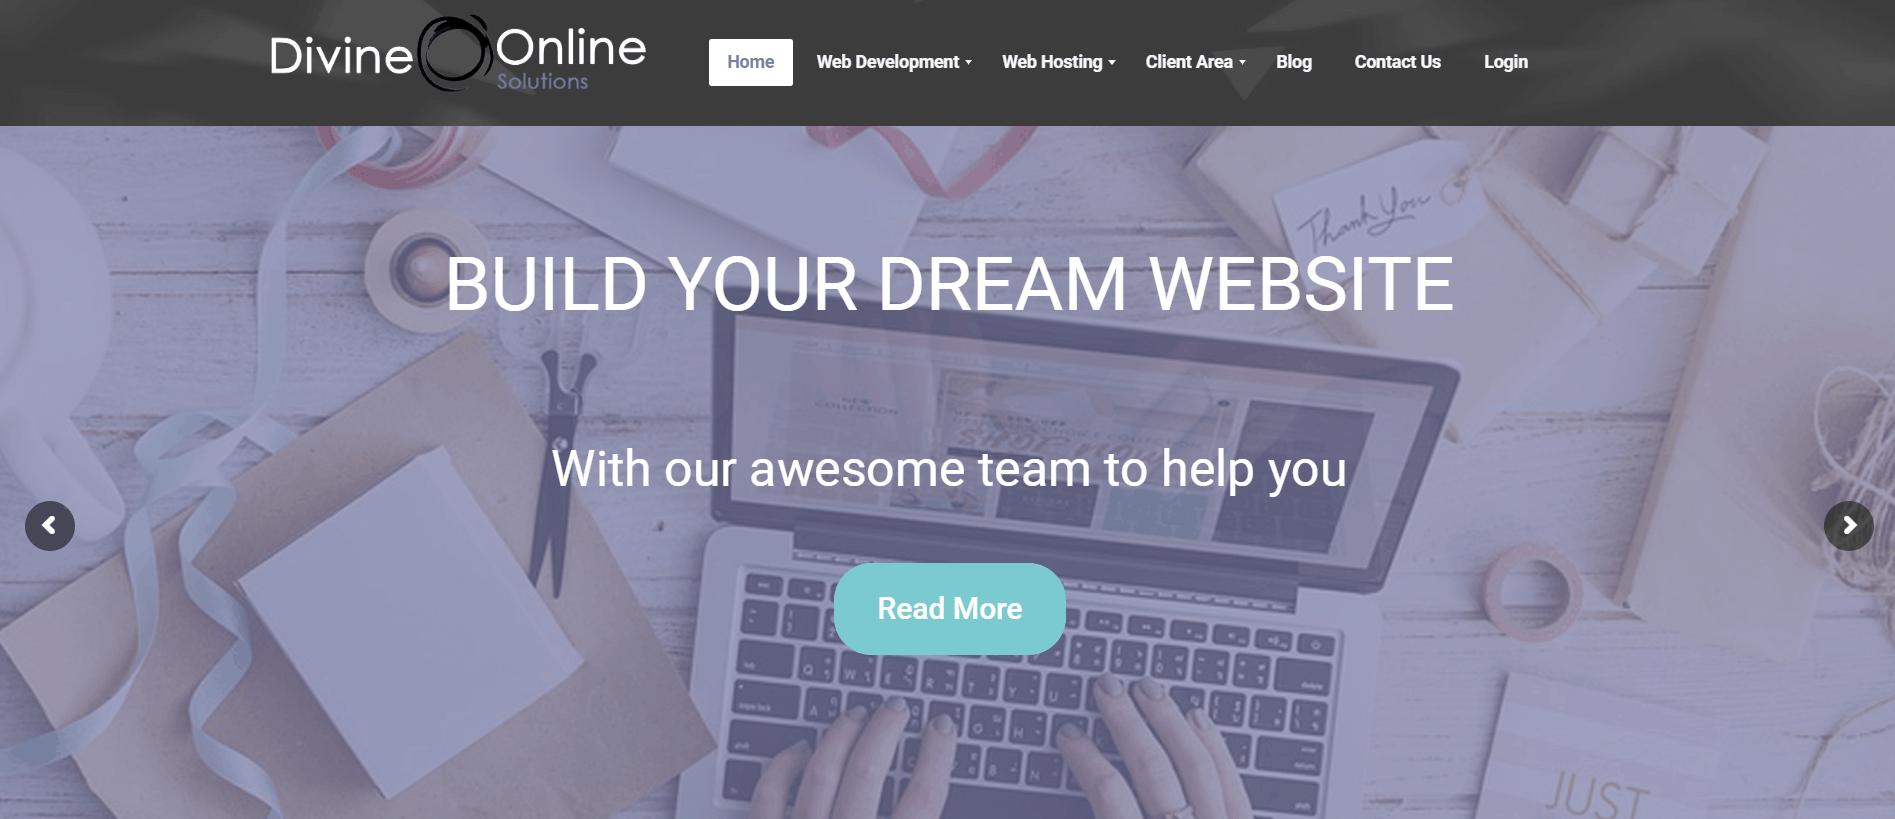 divine-online-solutions-mine